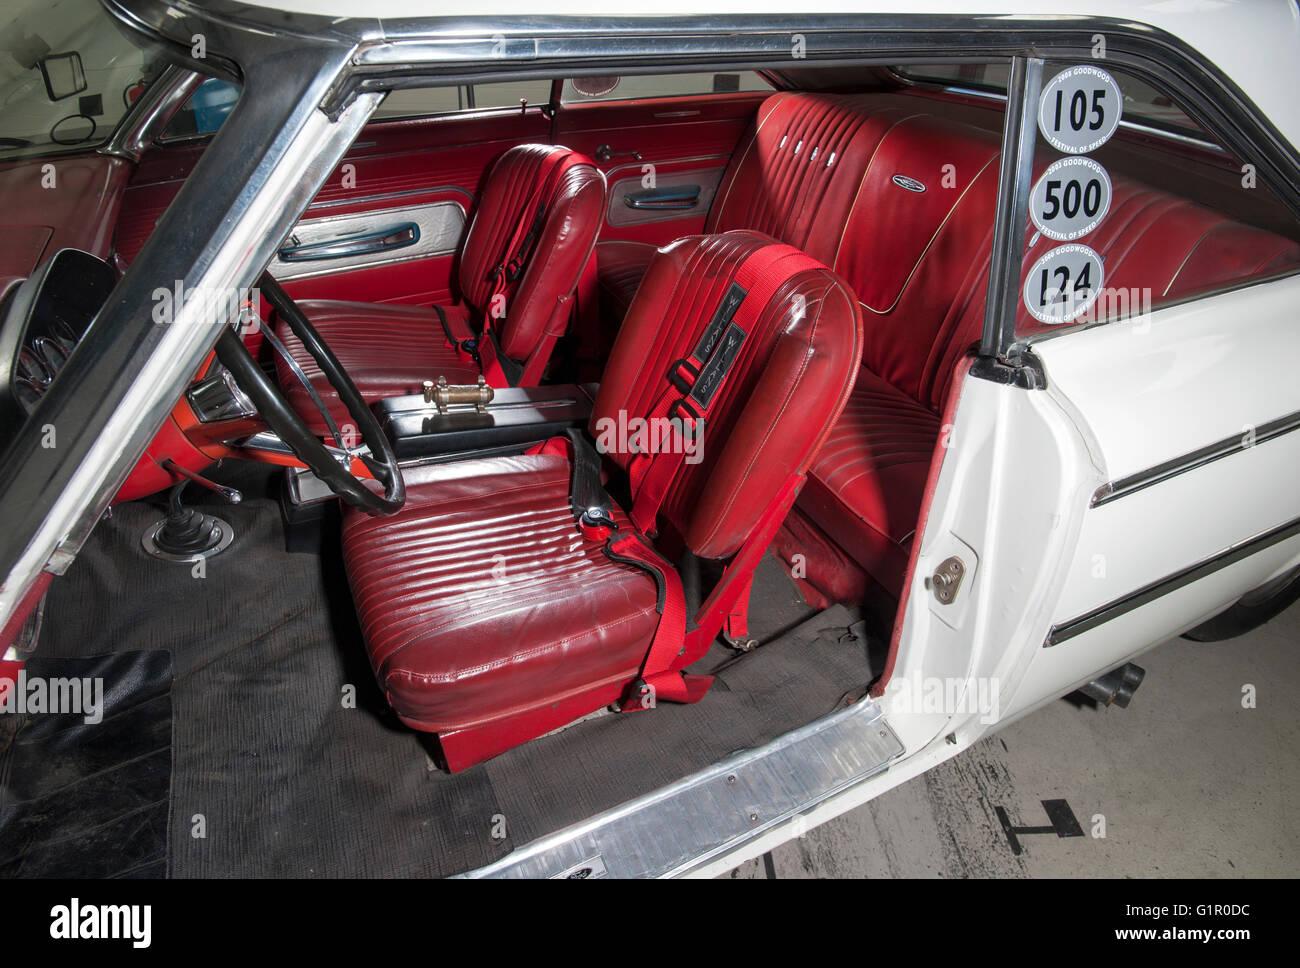 Sears Car: Racing Legend 'Gentleman' Jack Sears And His Ford Galaxie